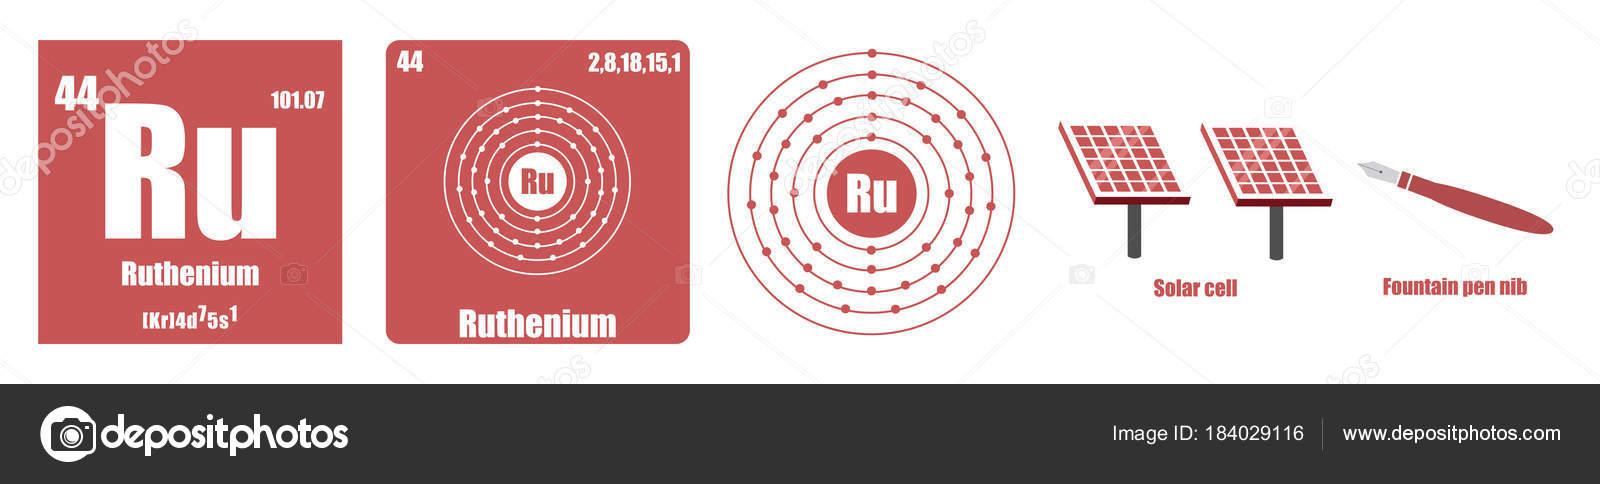 Tabla periodica elementos metales transicin archivo imgenes tabla periodica elementos metales transicin archivo imgenes vectoriales urtaz Images